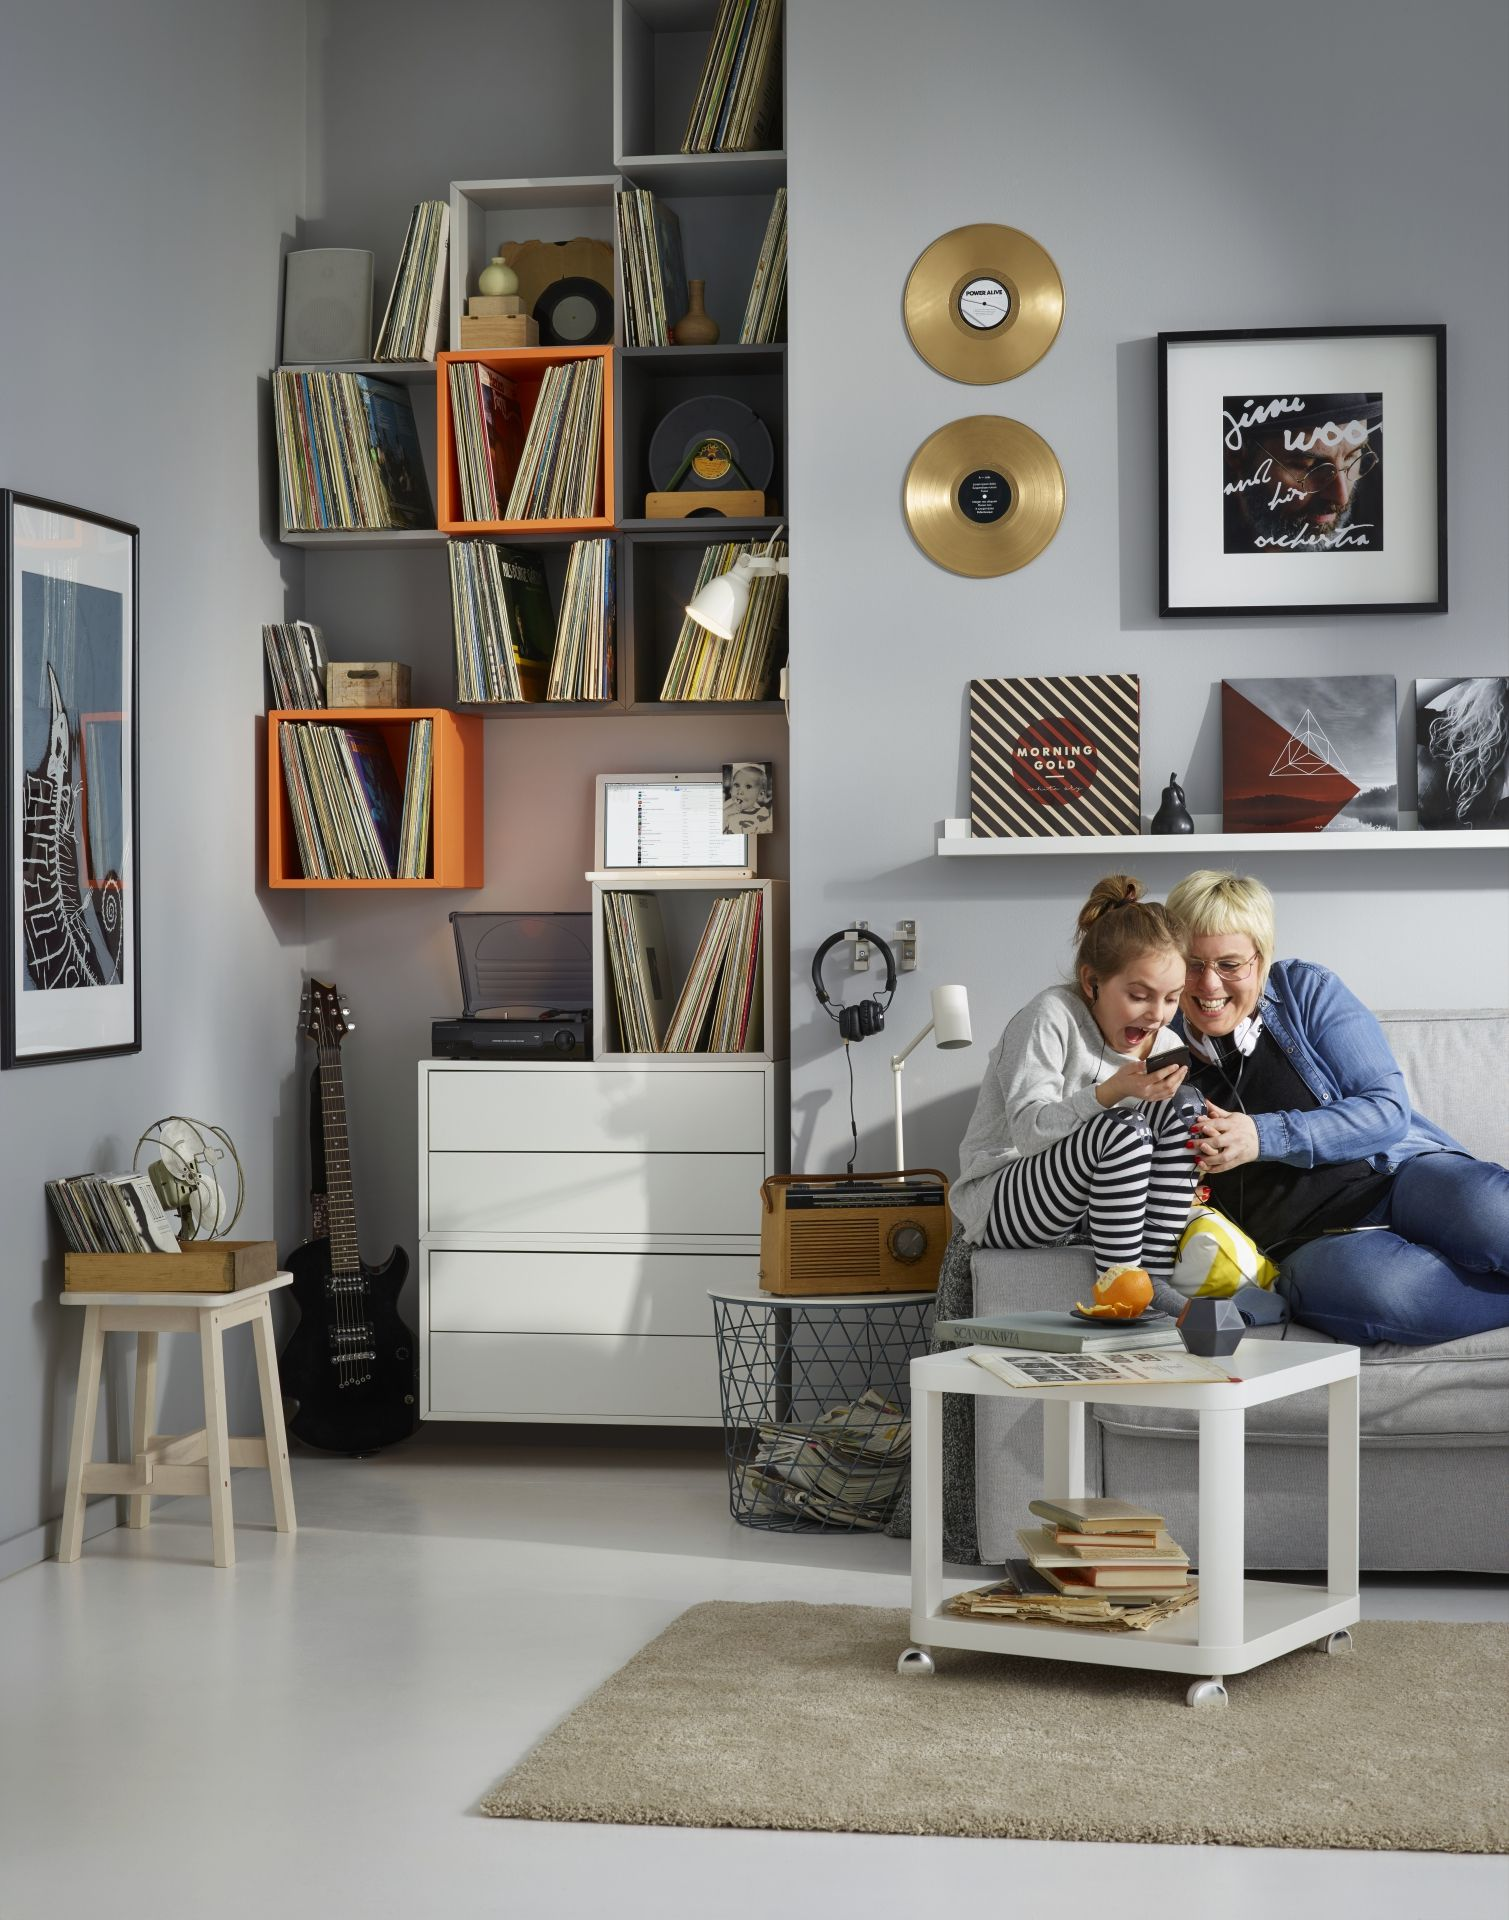 EKET kast met lades | IKEAcatalogus nieuw 2018 IKEA IKEAnl ...